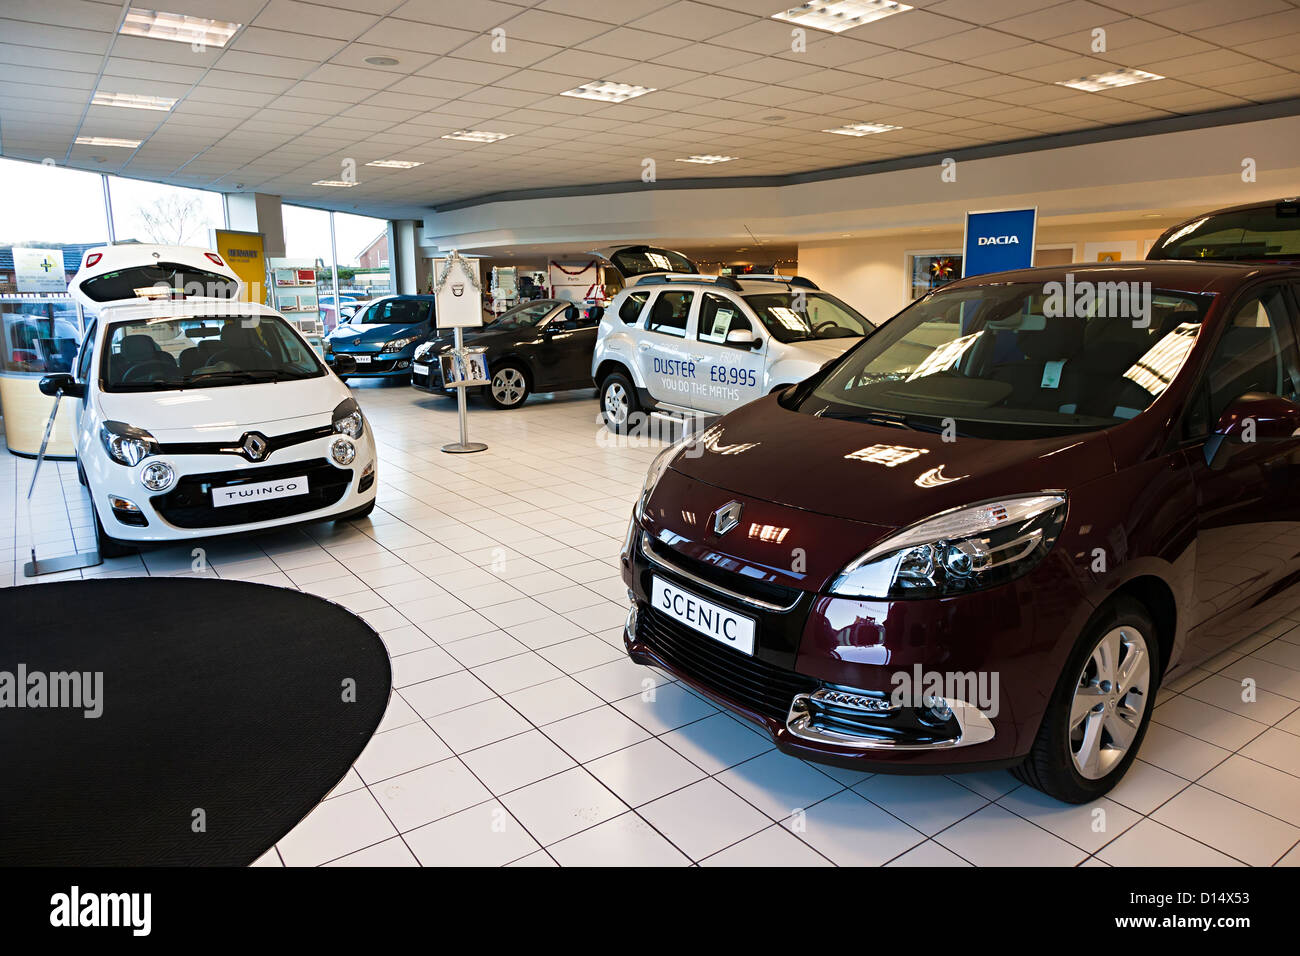 New car showroom, England, UK - Stock Image